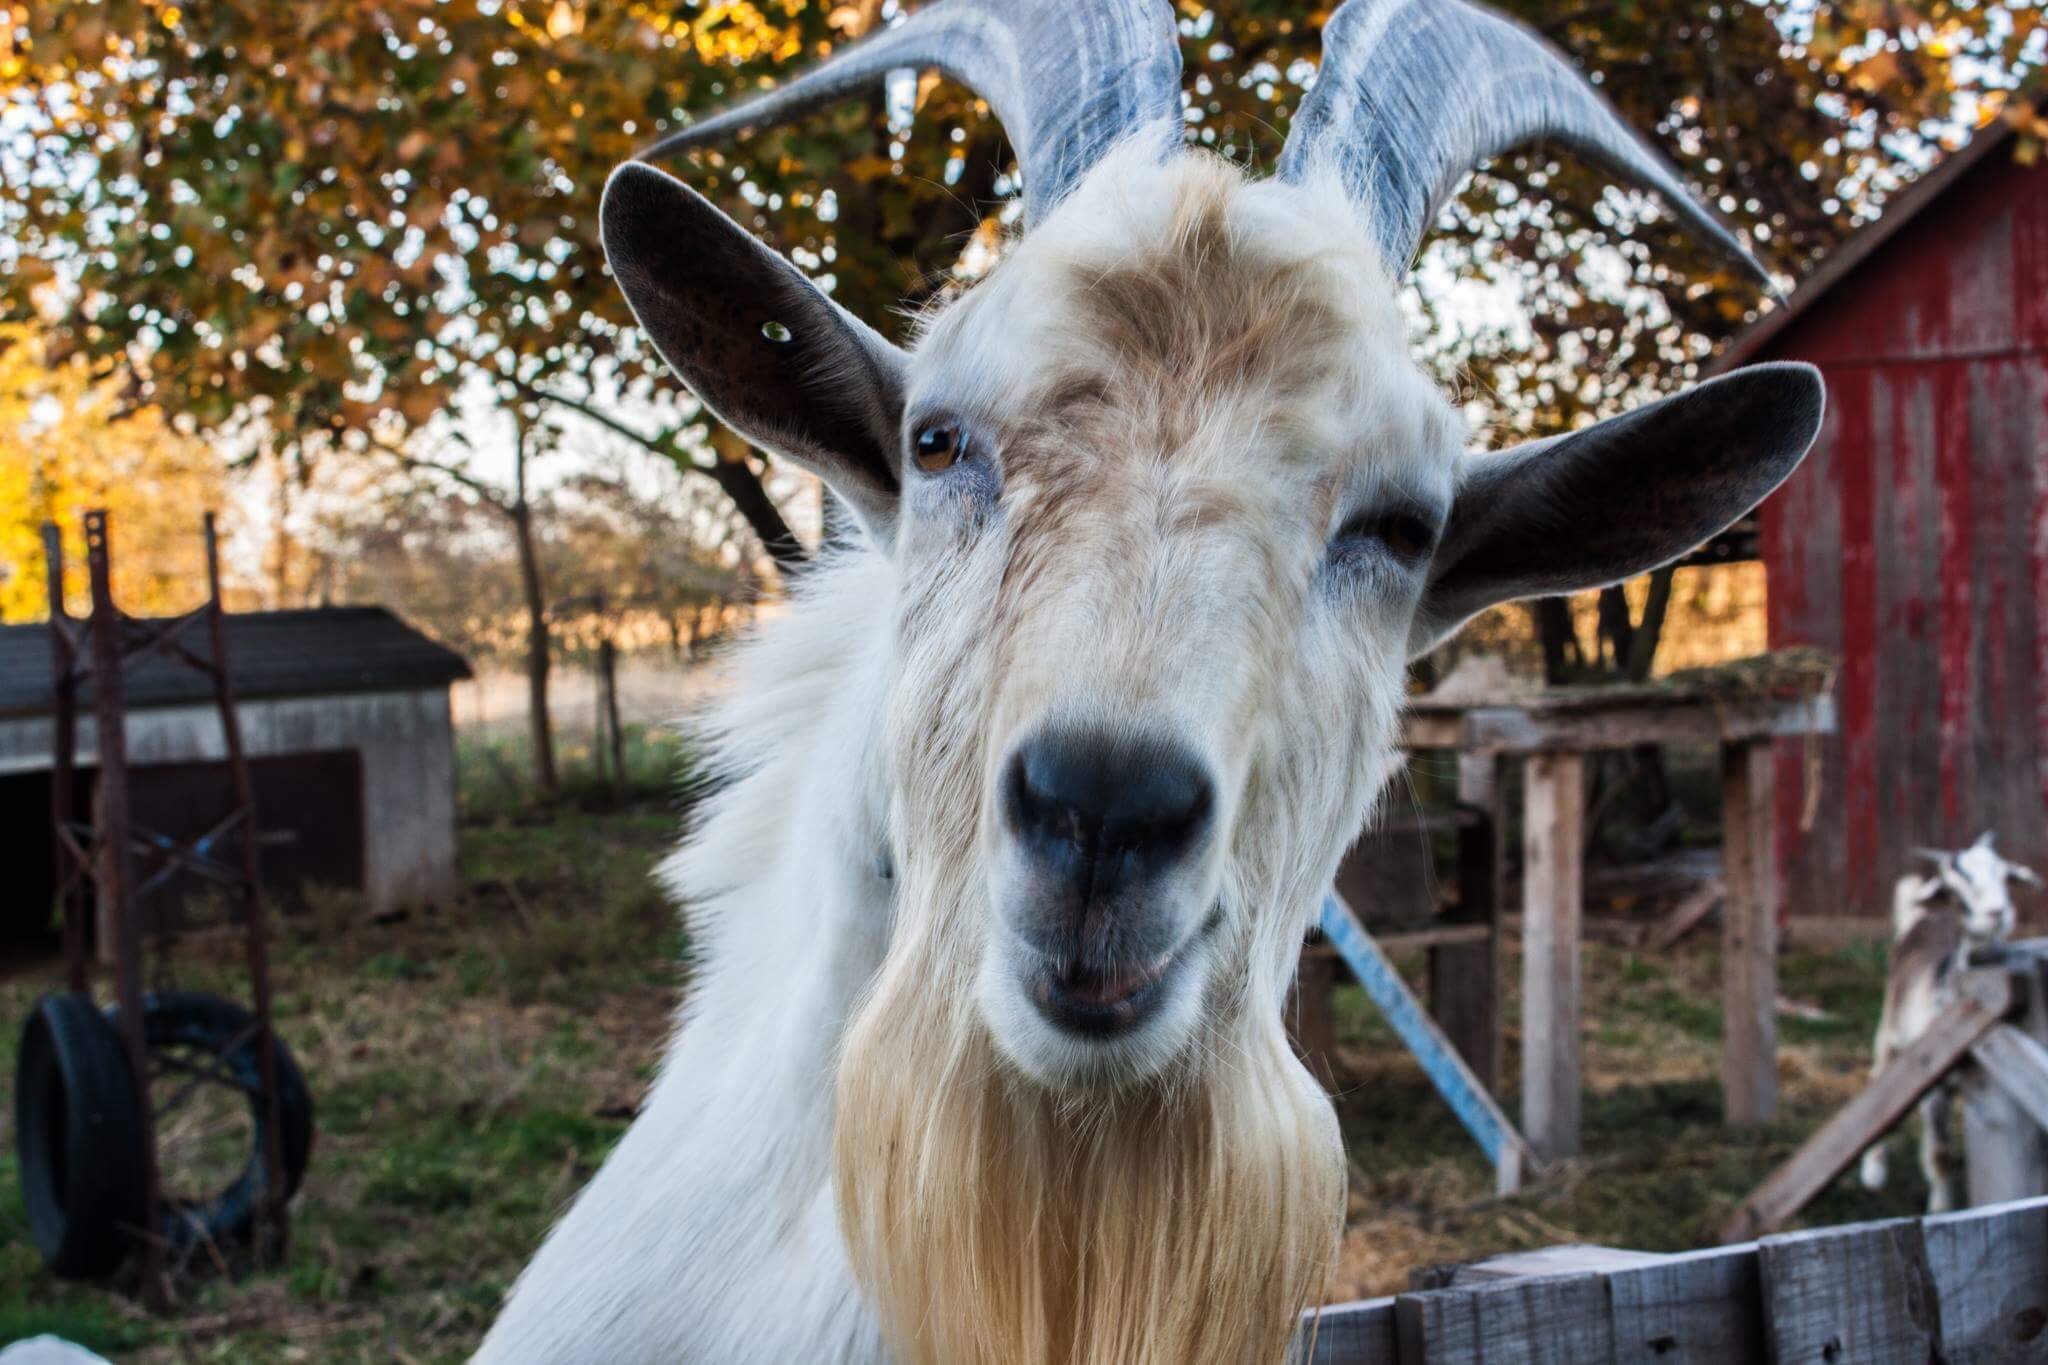 Razor The Goat by Mercedes Tortat